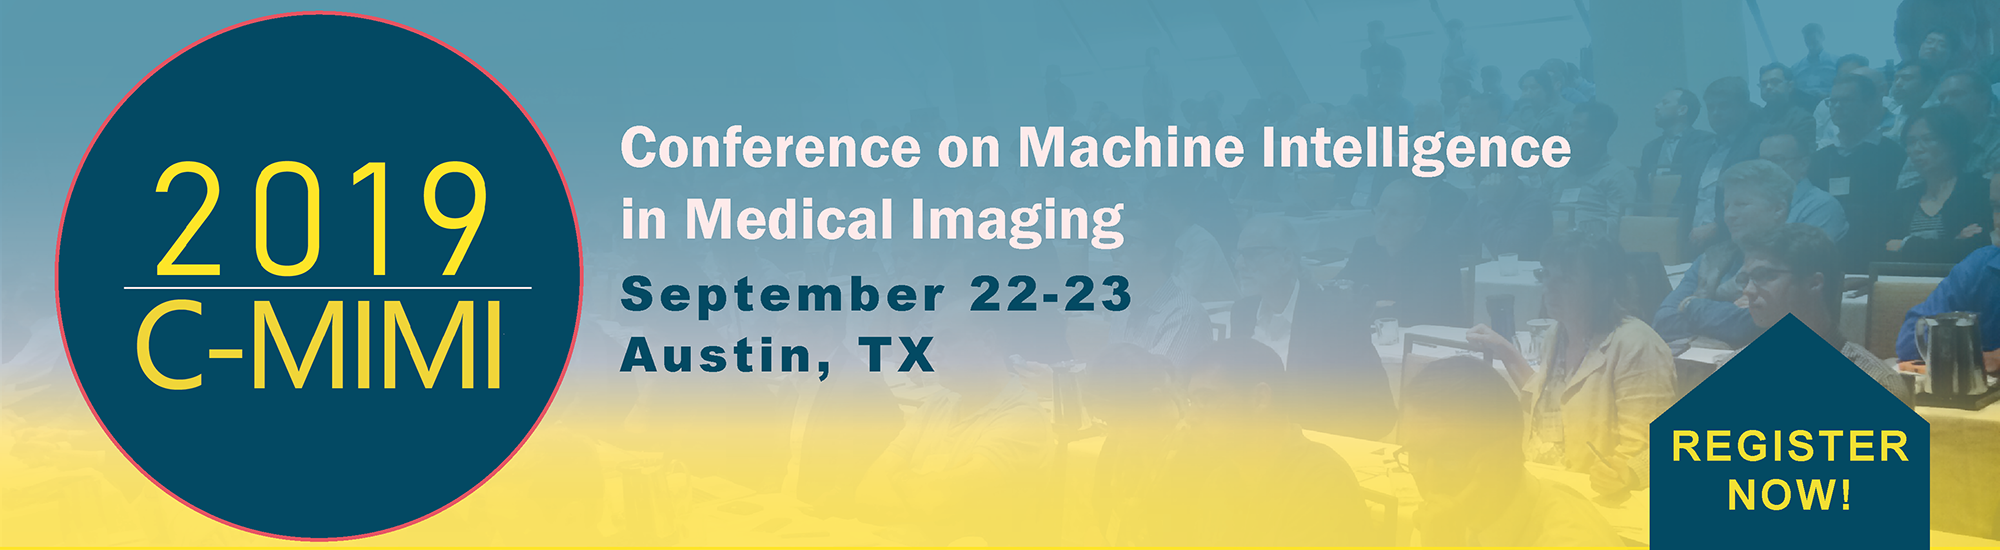 Society for Imaging Informatics in Medicine